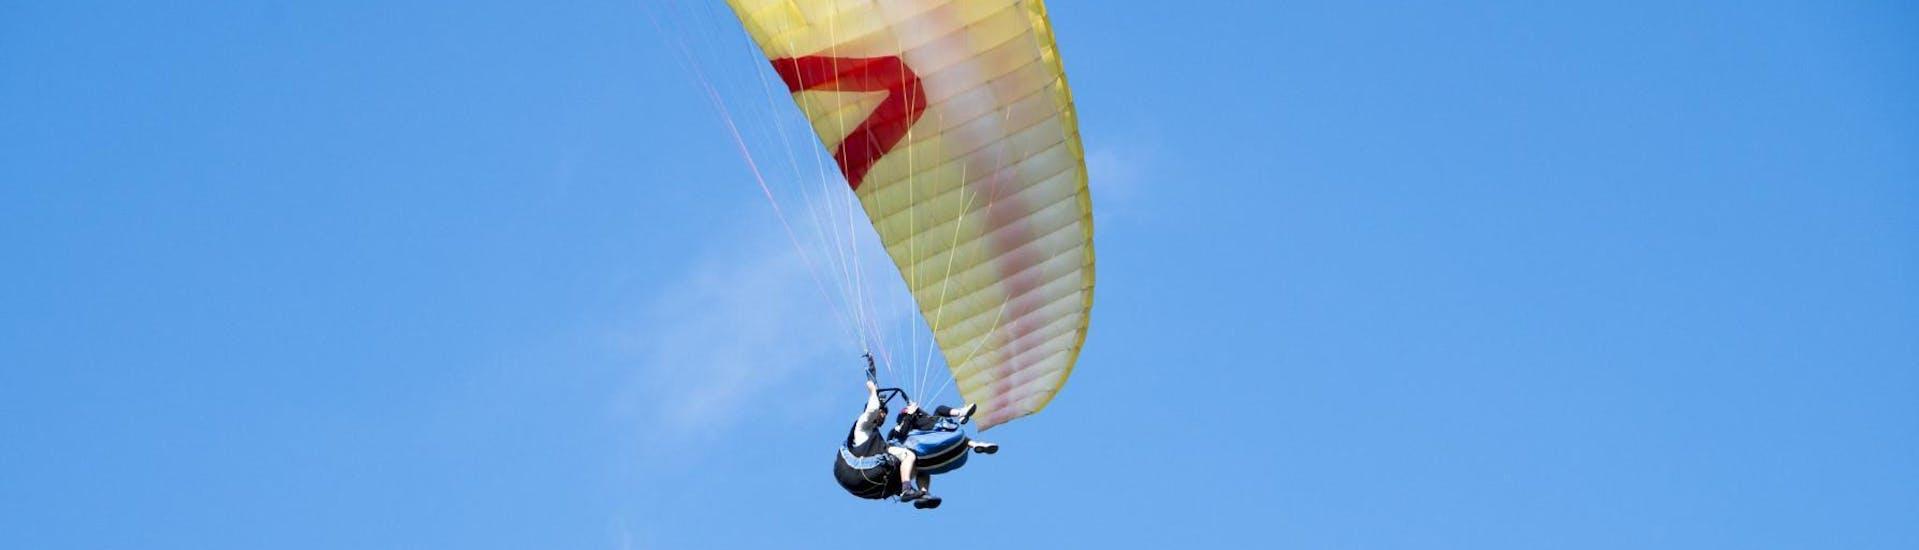 tandem-paragliding-at-lake-tribalj-sky-riders-paragliding-croatia-hero